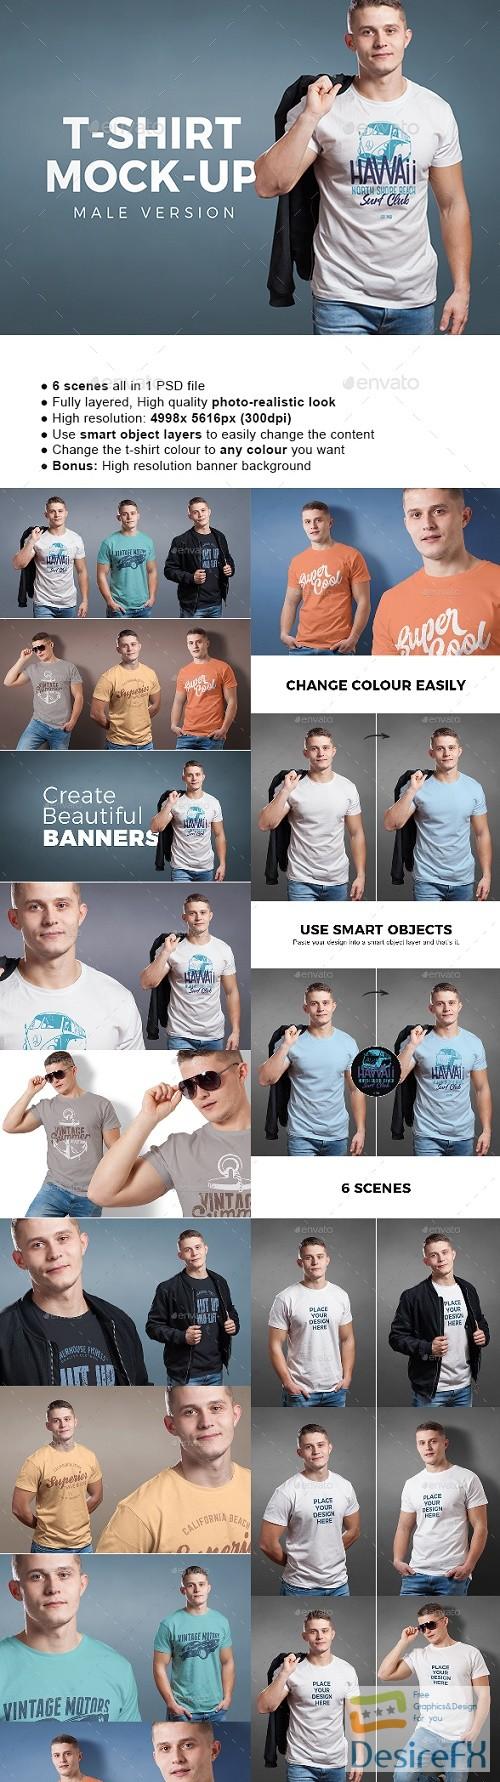 t-shirts-prints - Male T-shirt Mock-up 22161321